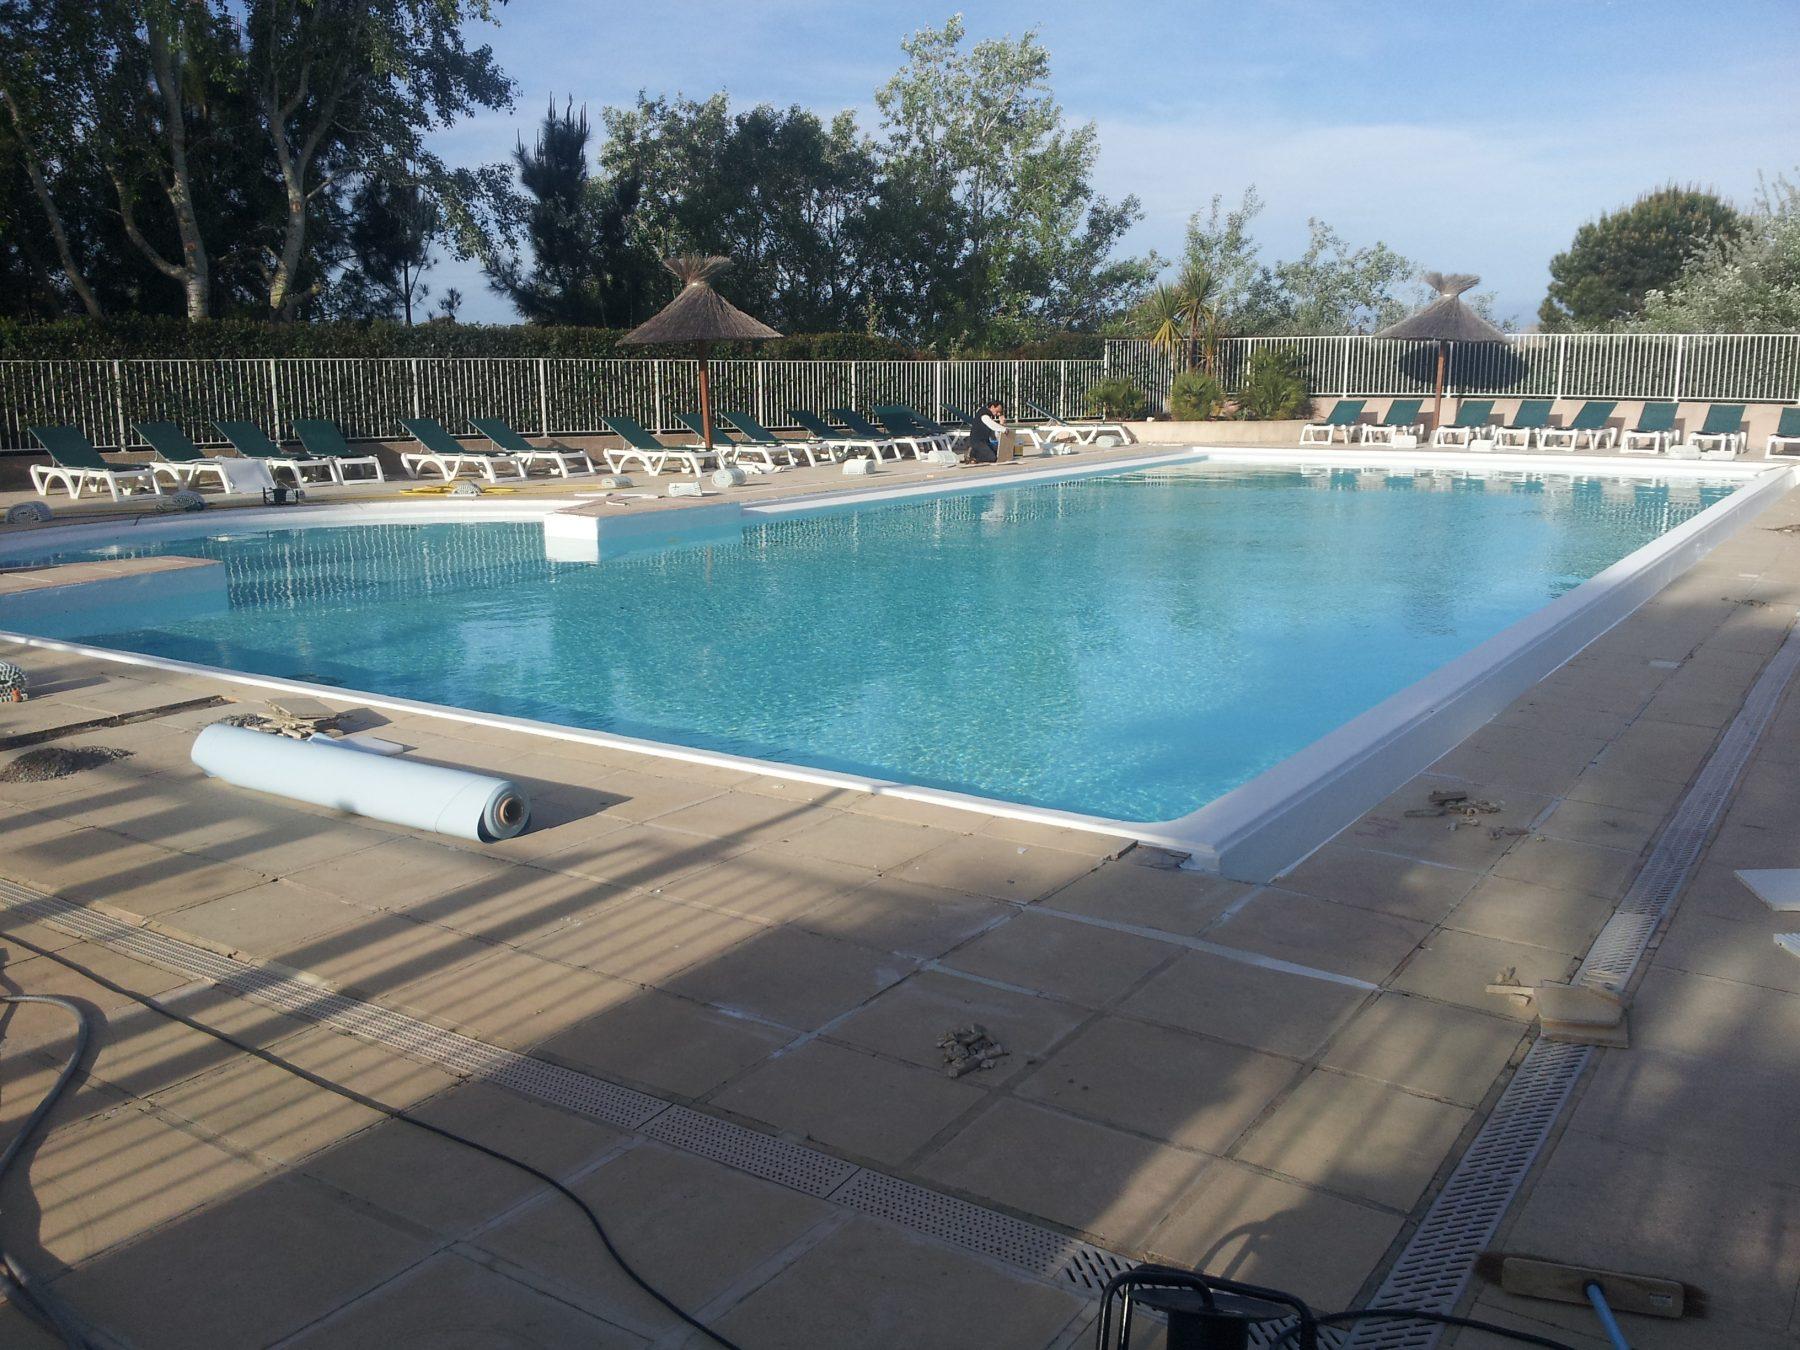 Rénovation piscine béton Gard, Grau du roi